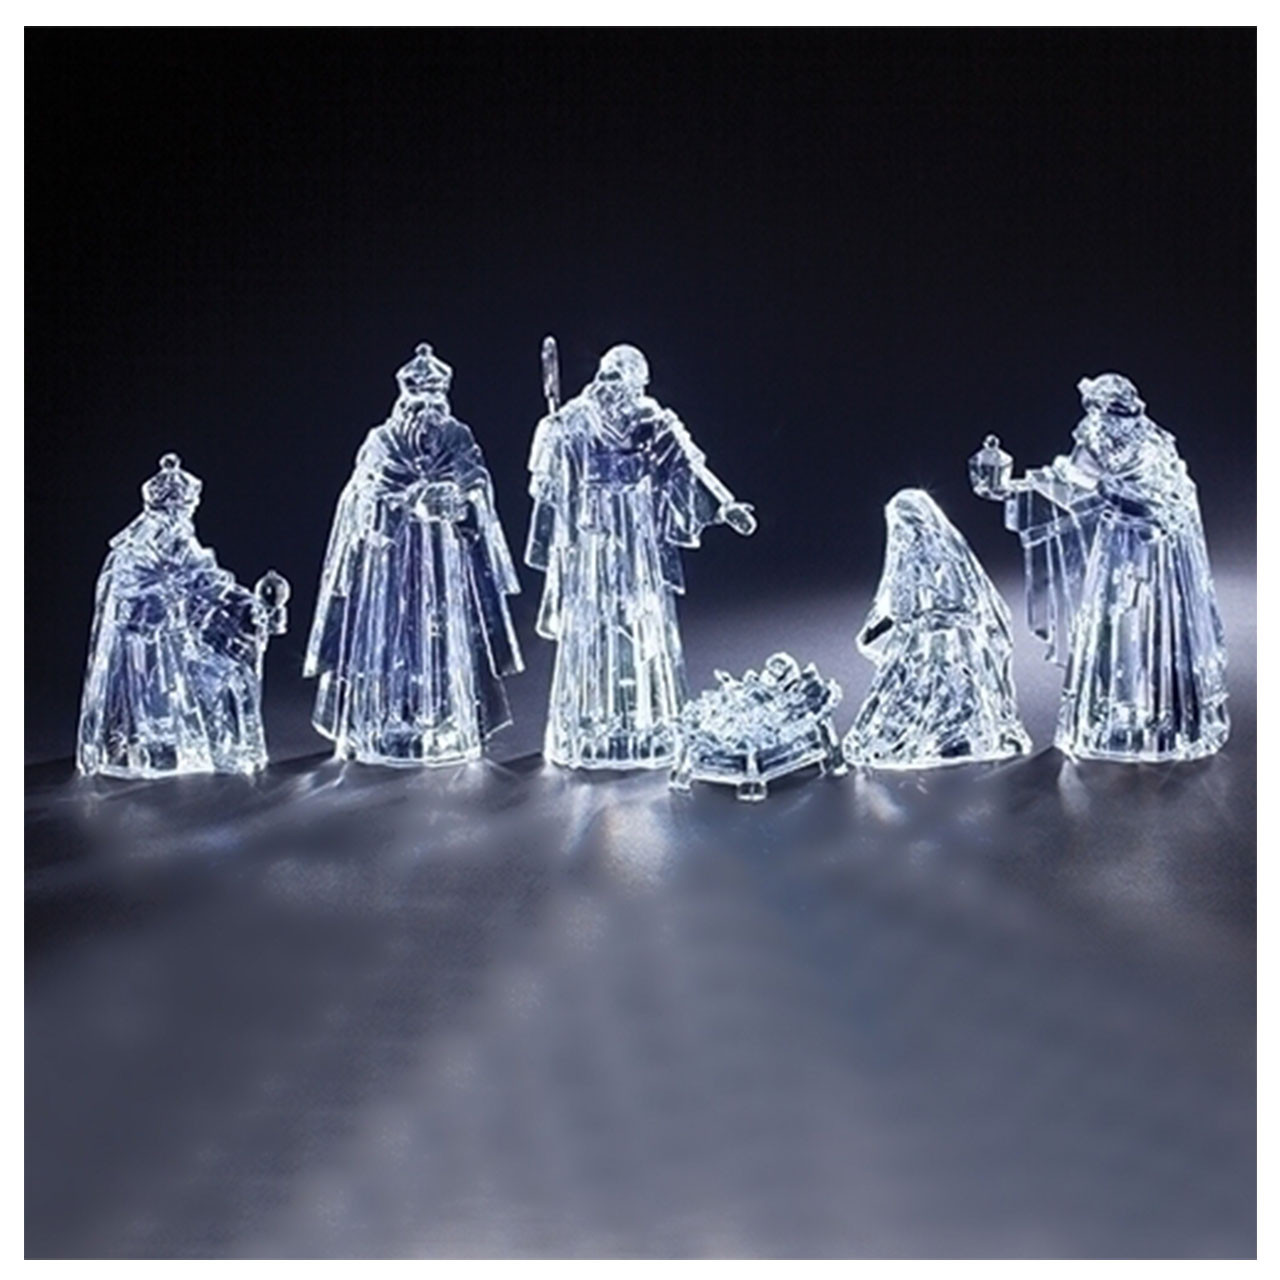 6pc Nativity Set in Acrylic